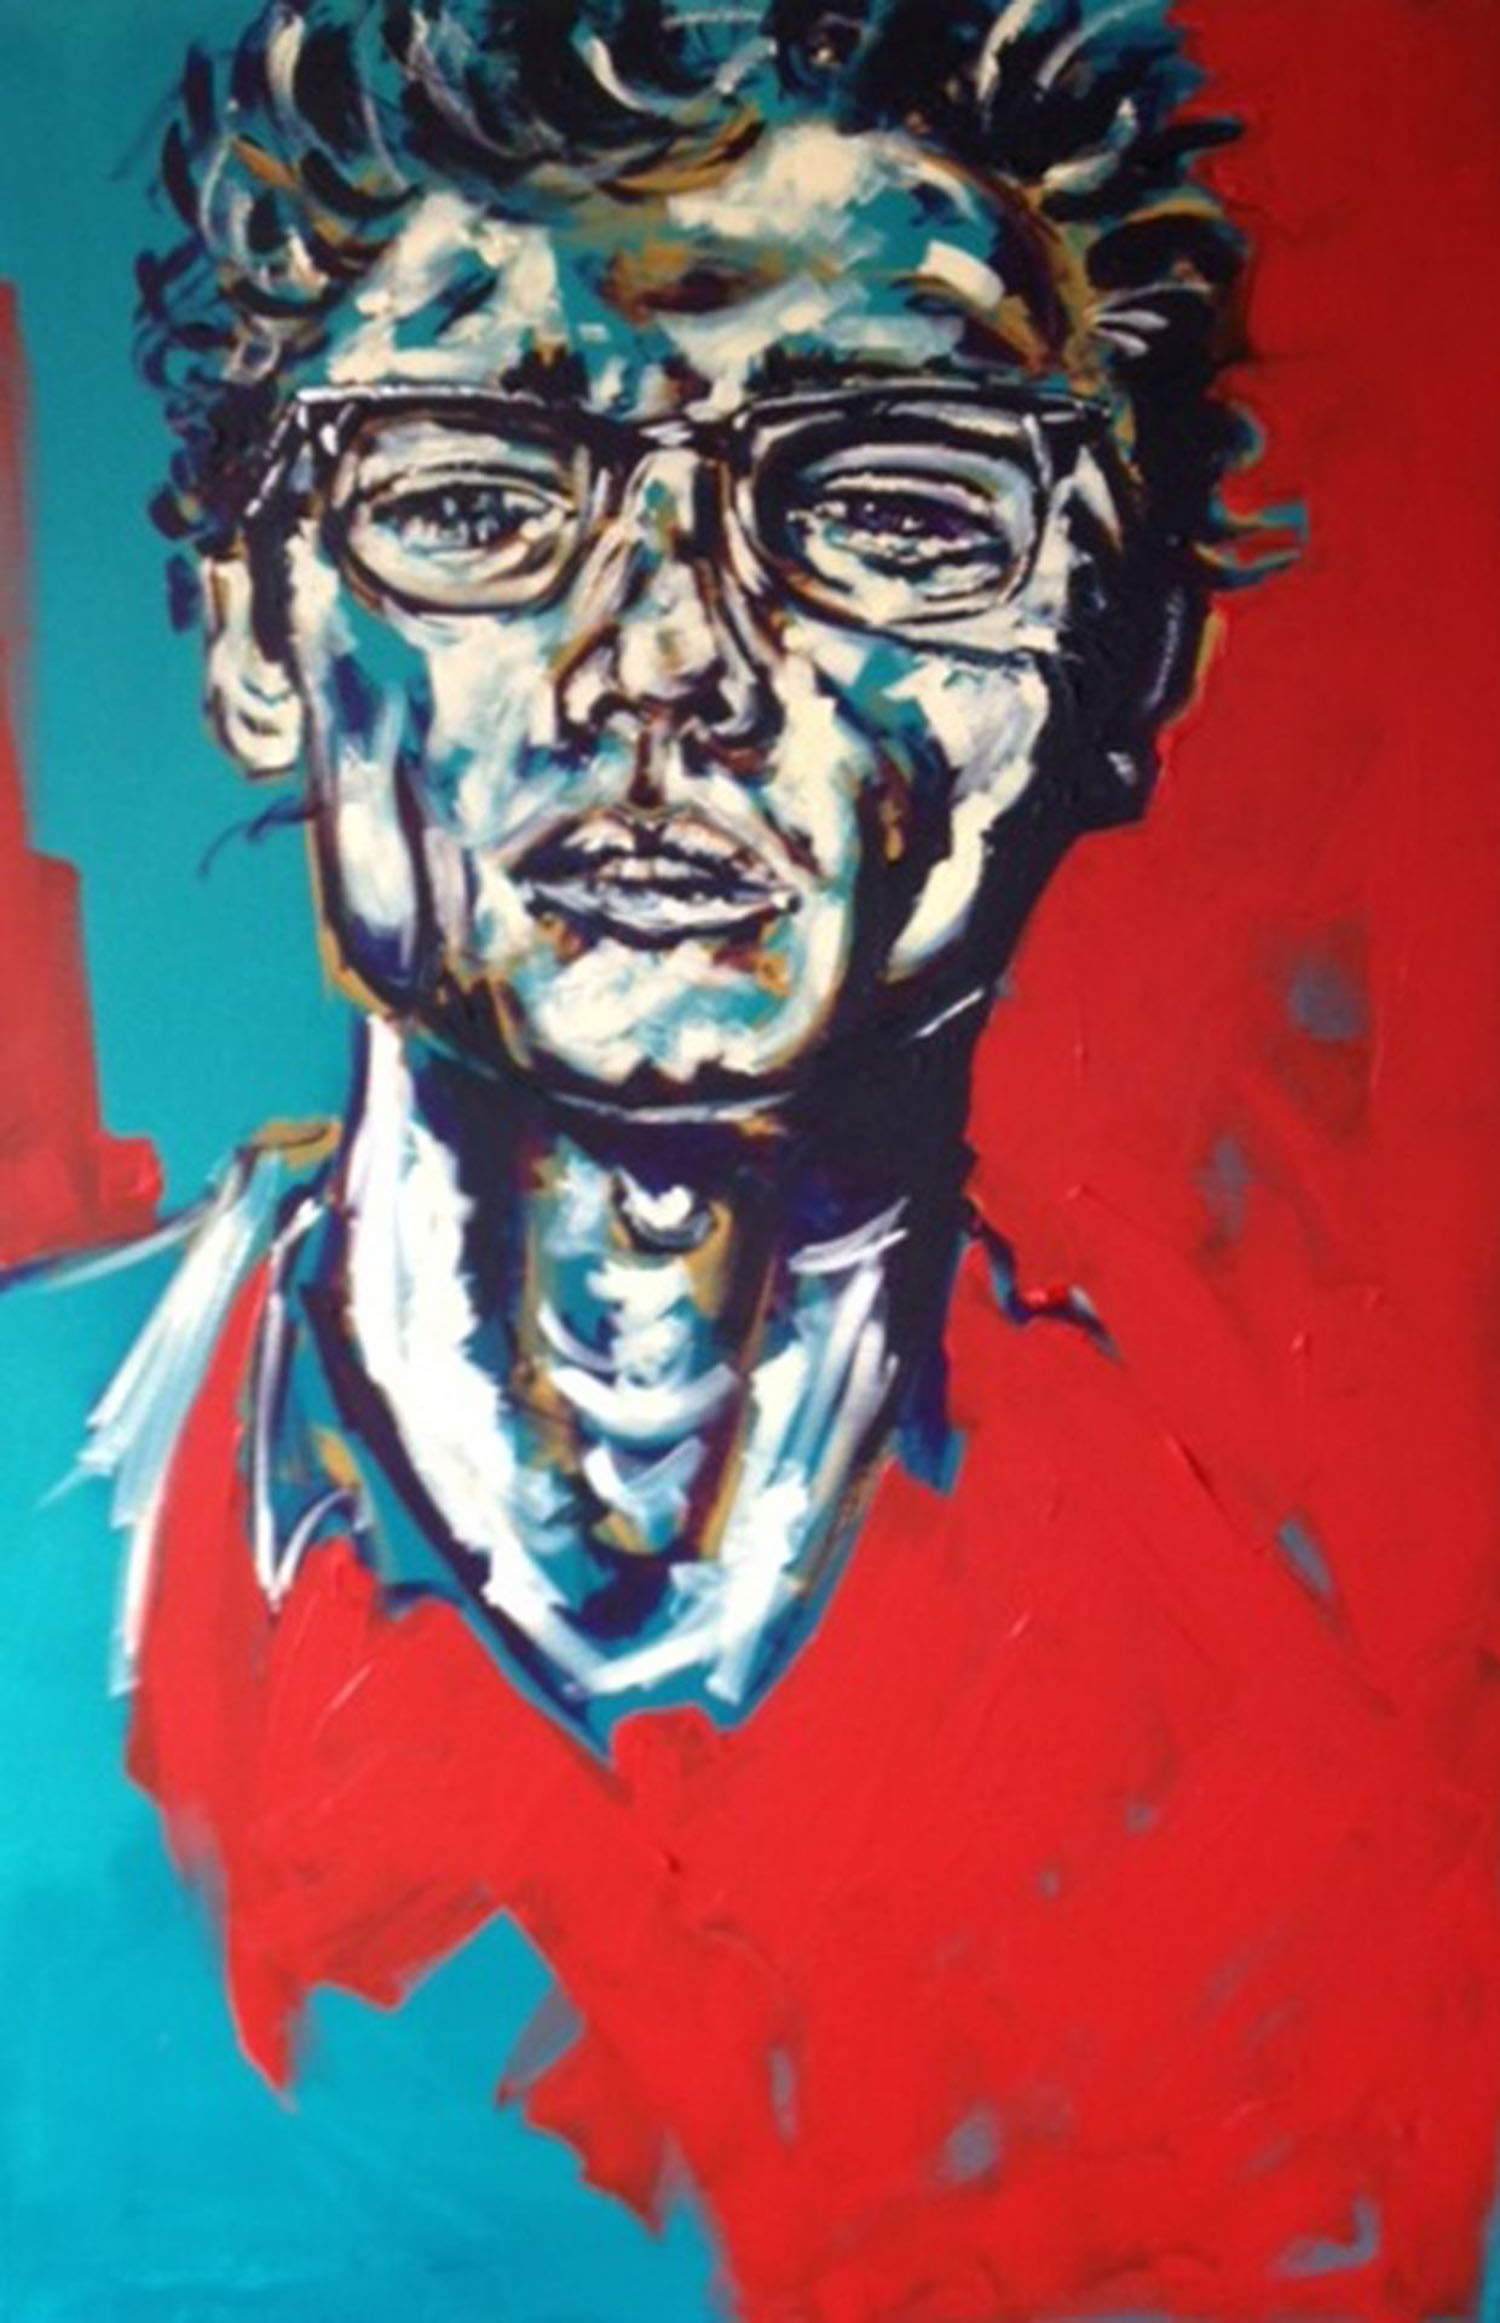 art, painting, portrait - mdartanddesign | ello